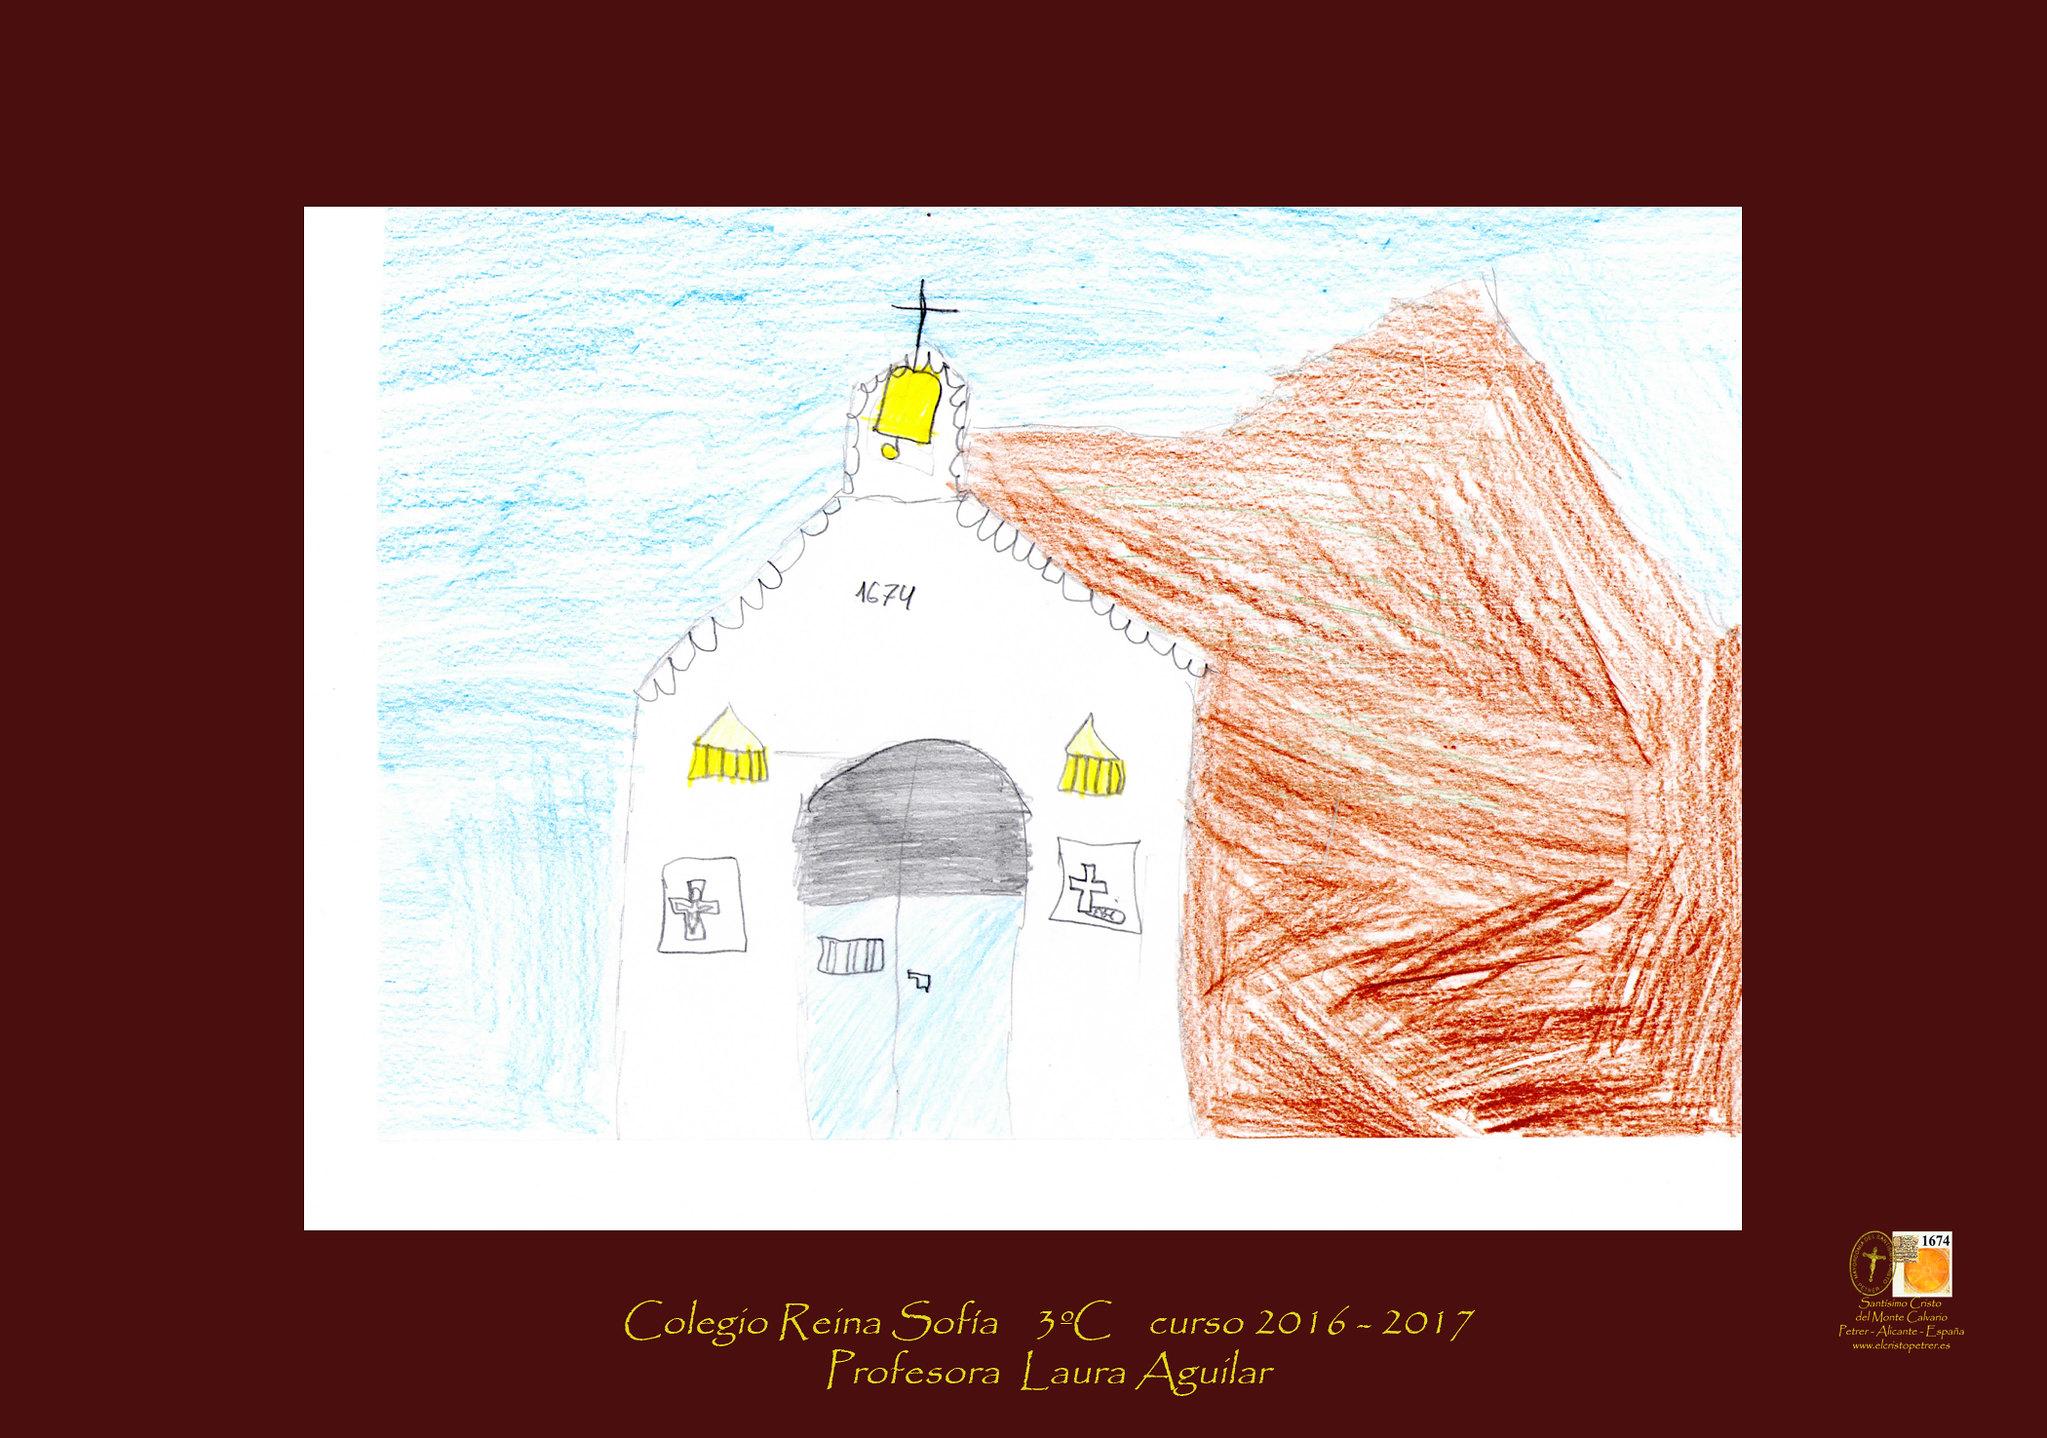 ElCristo - Actos - Exposicion Fotografica - (2017-12-01) - Reina sofía - 3ºA - (sin nombre)